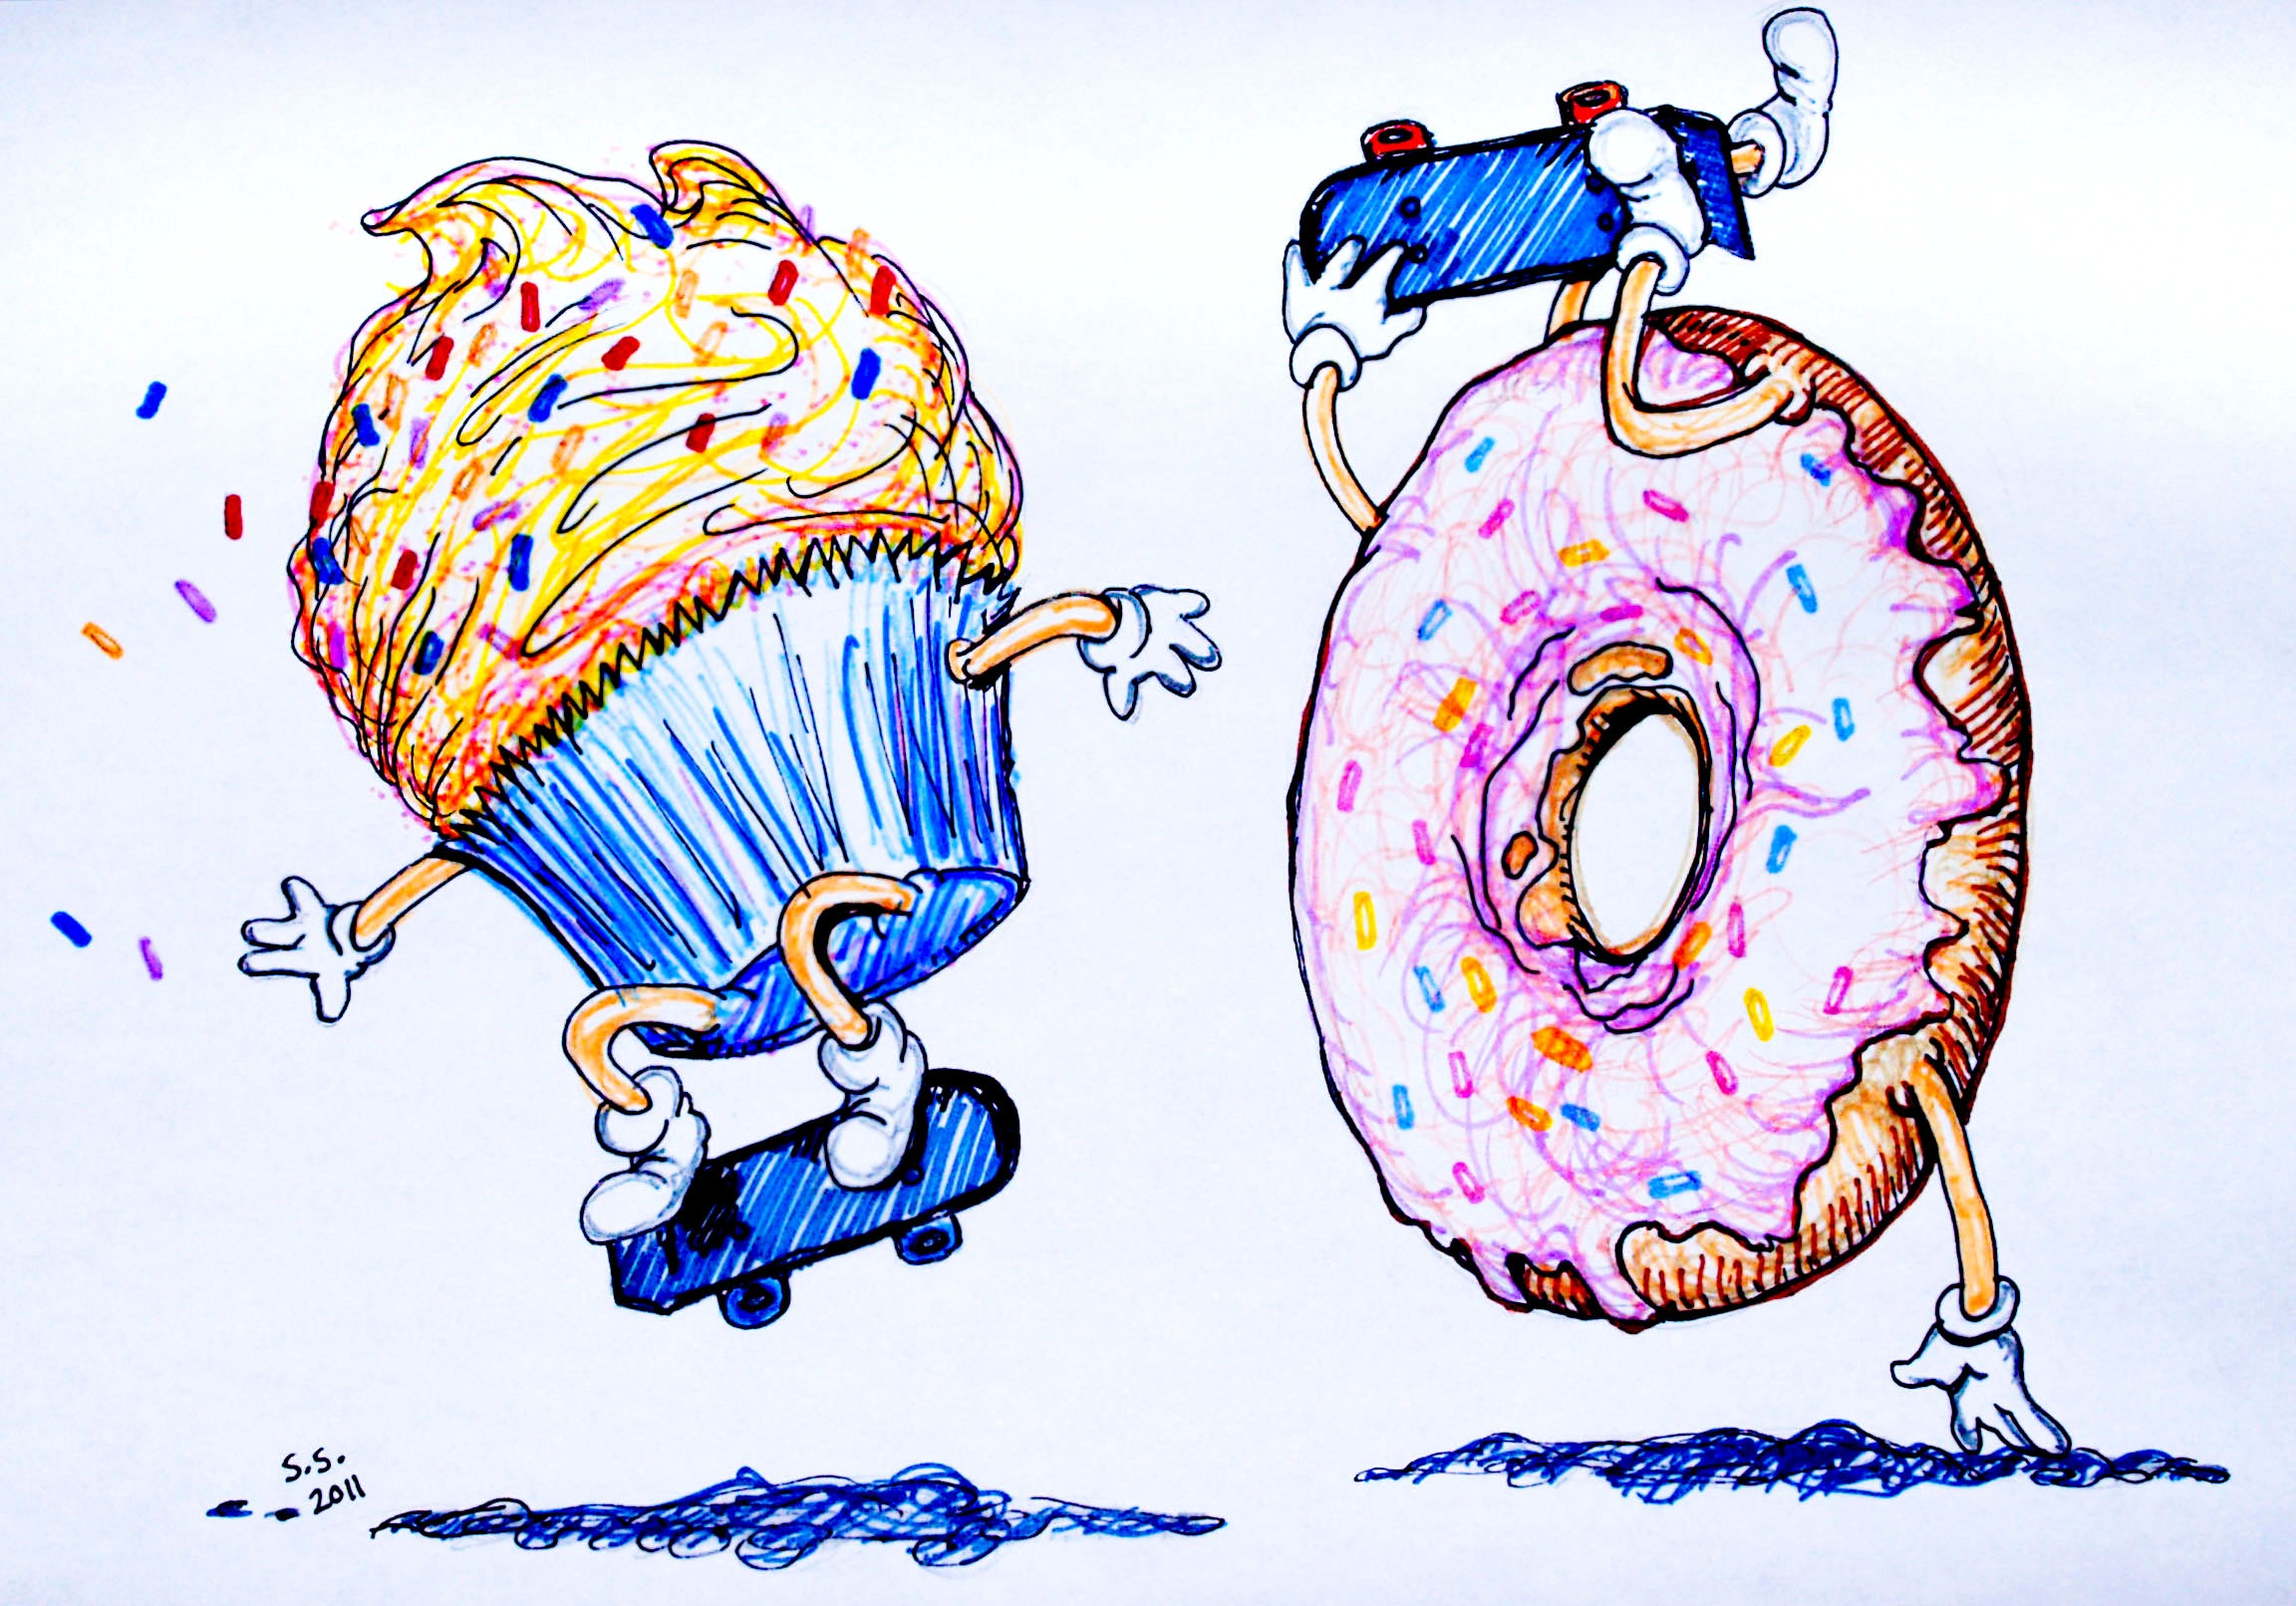 Cupcake and Donut Pushing Wood